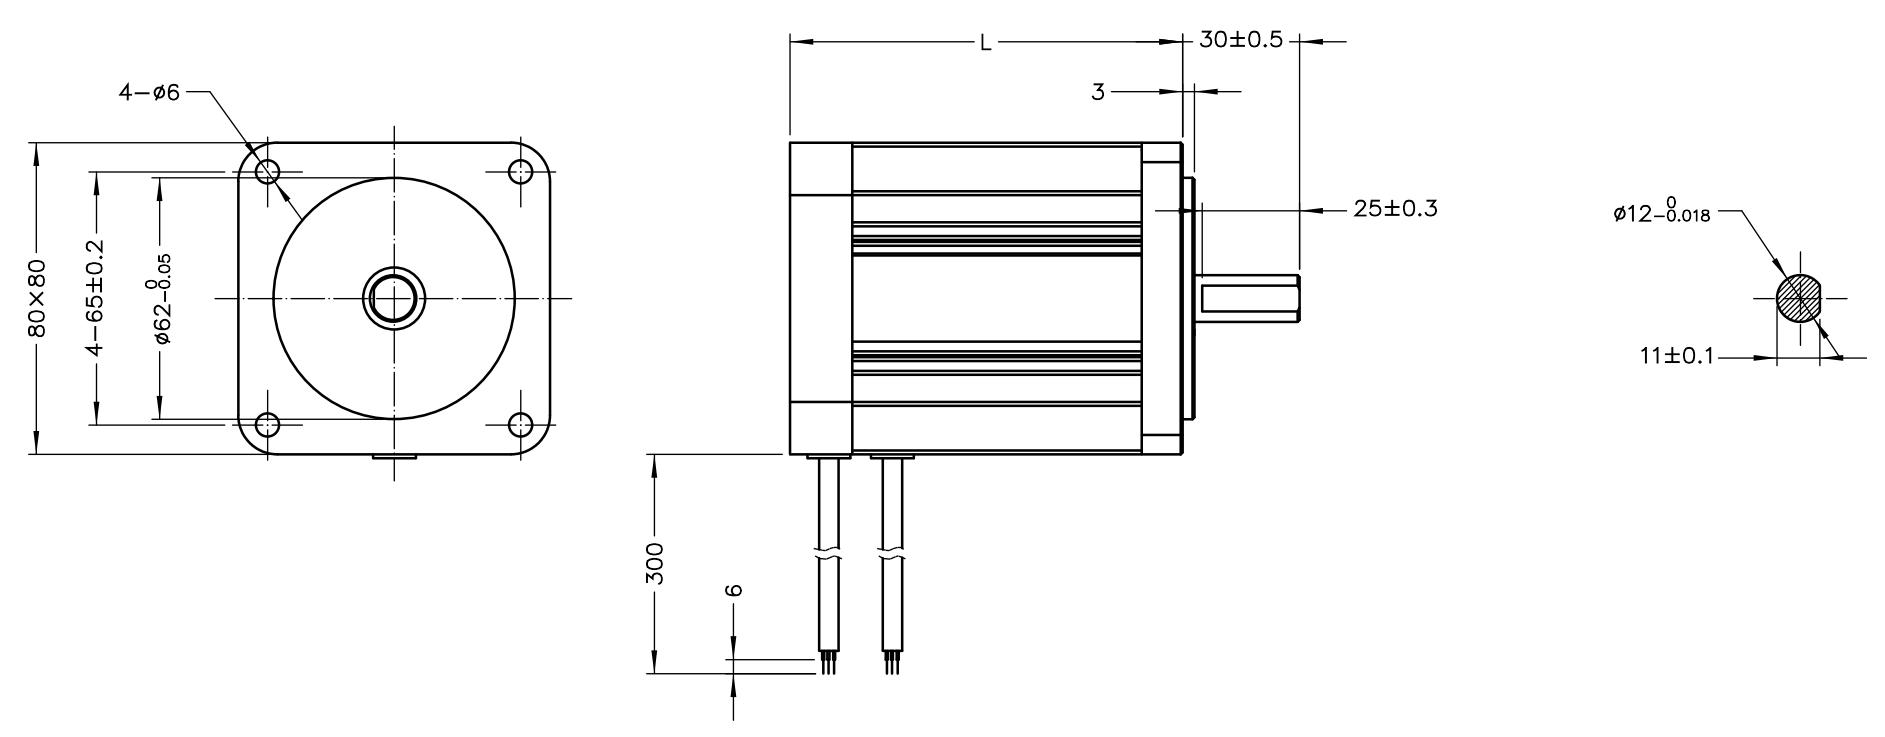 NEMA 32 BLDC Drawing